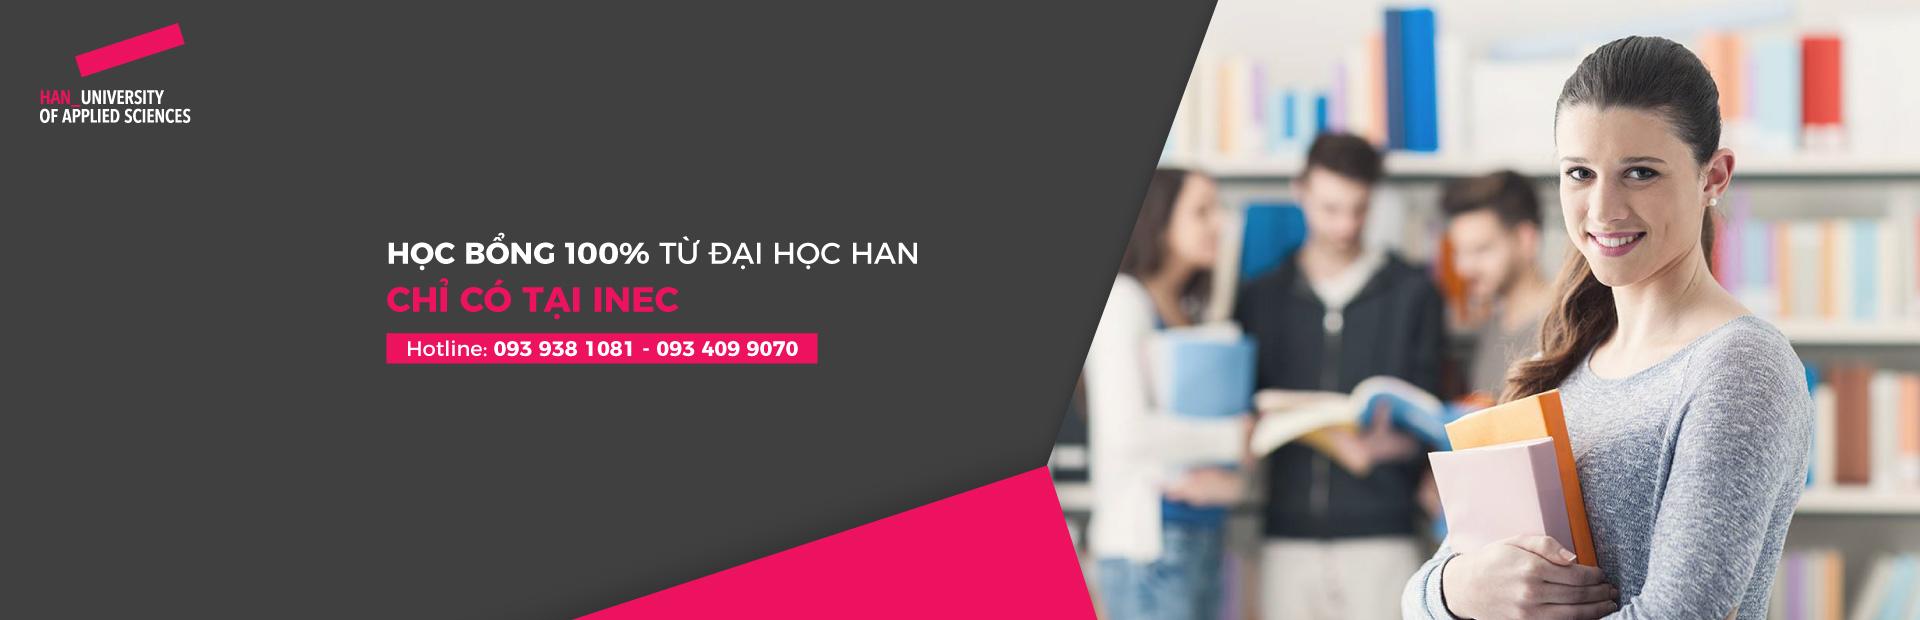 HAN 100 hoc bong